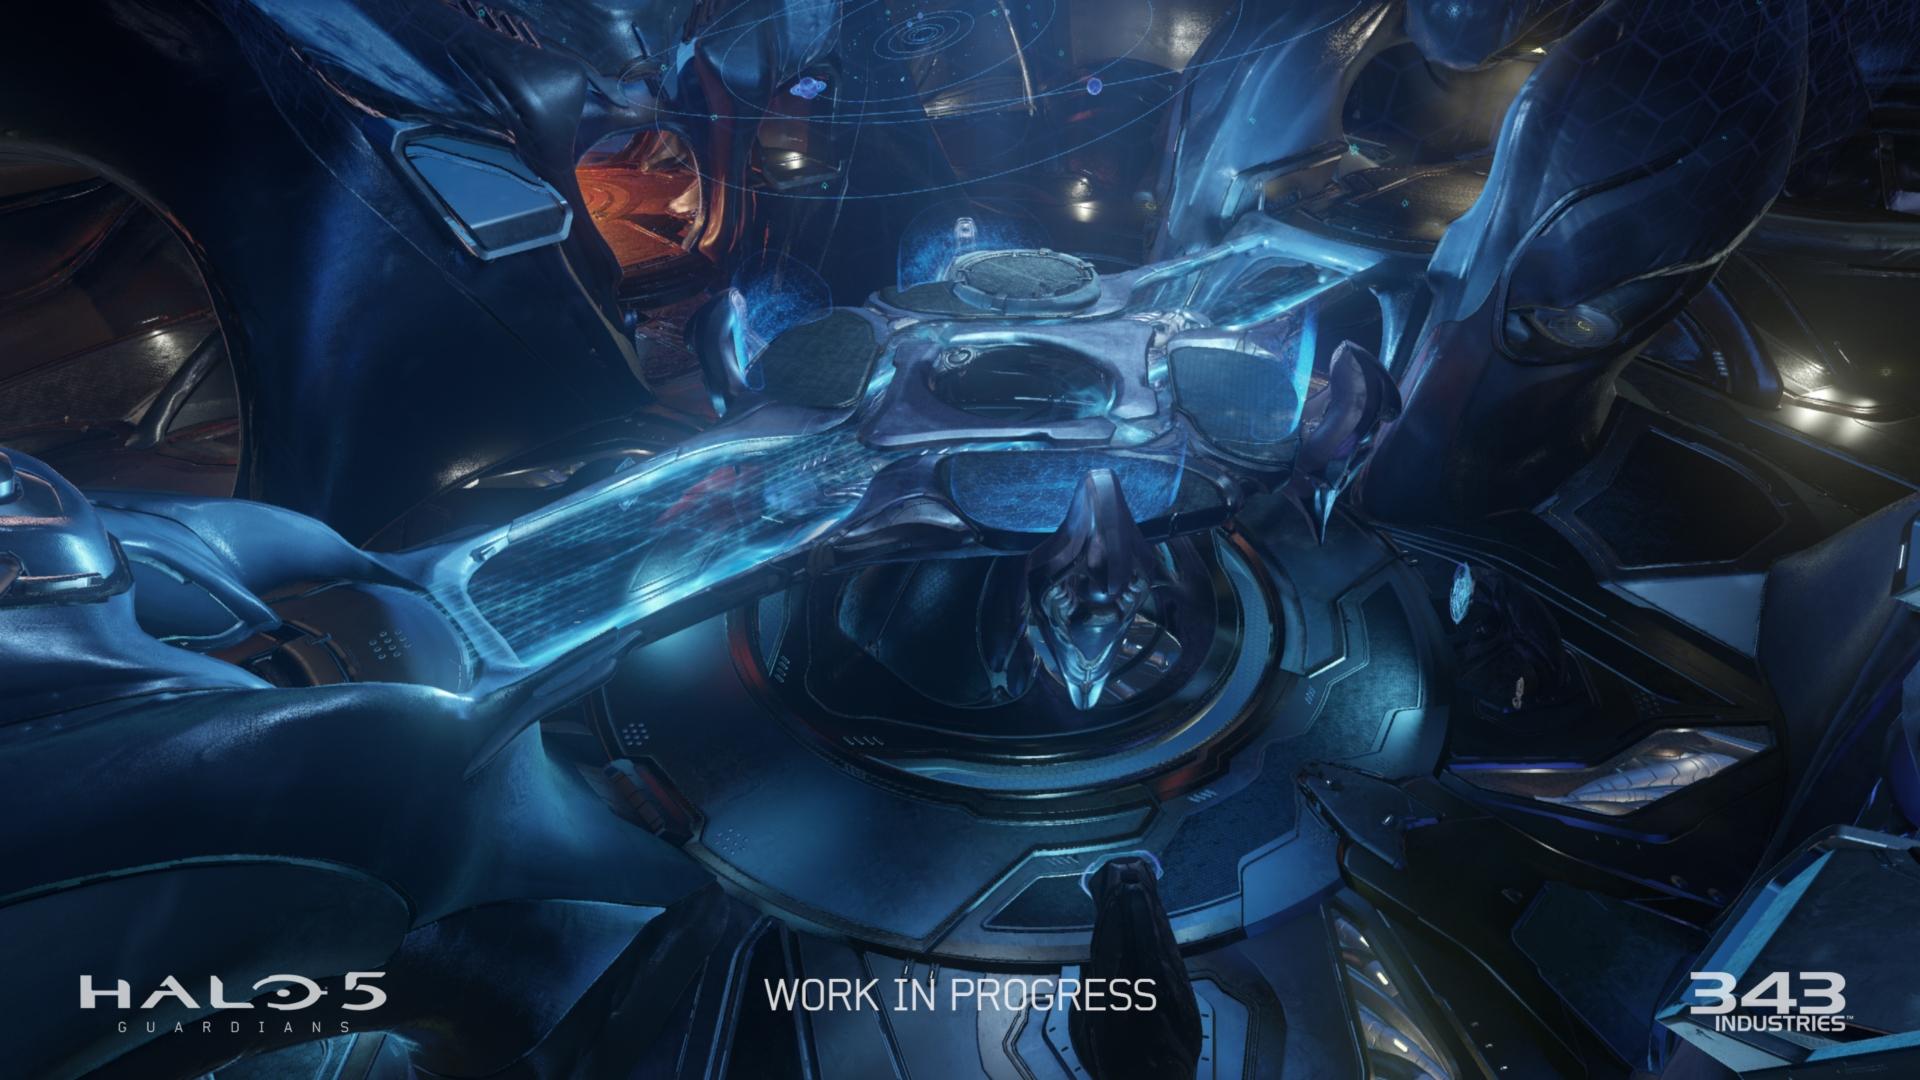 Halo 5 Guardians Video Game 38 Hd Wallpaper   Hivewallpapercom 1920x1080